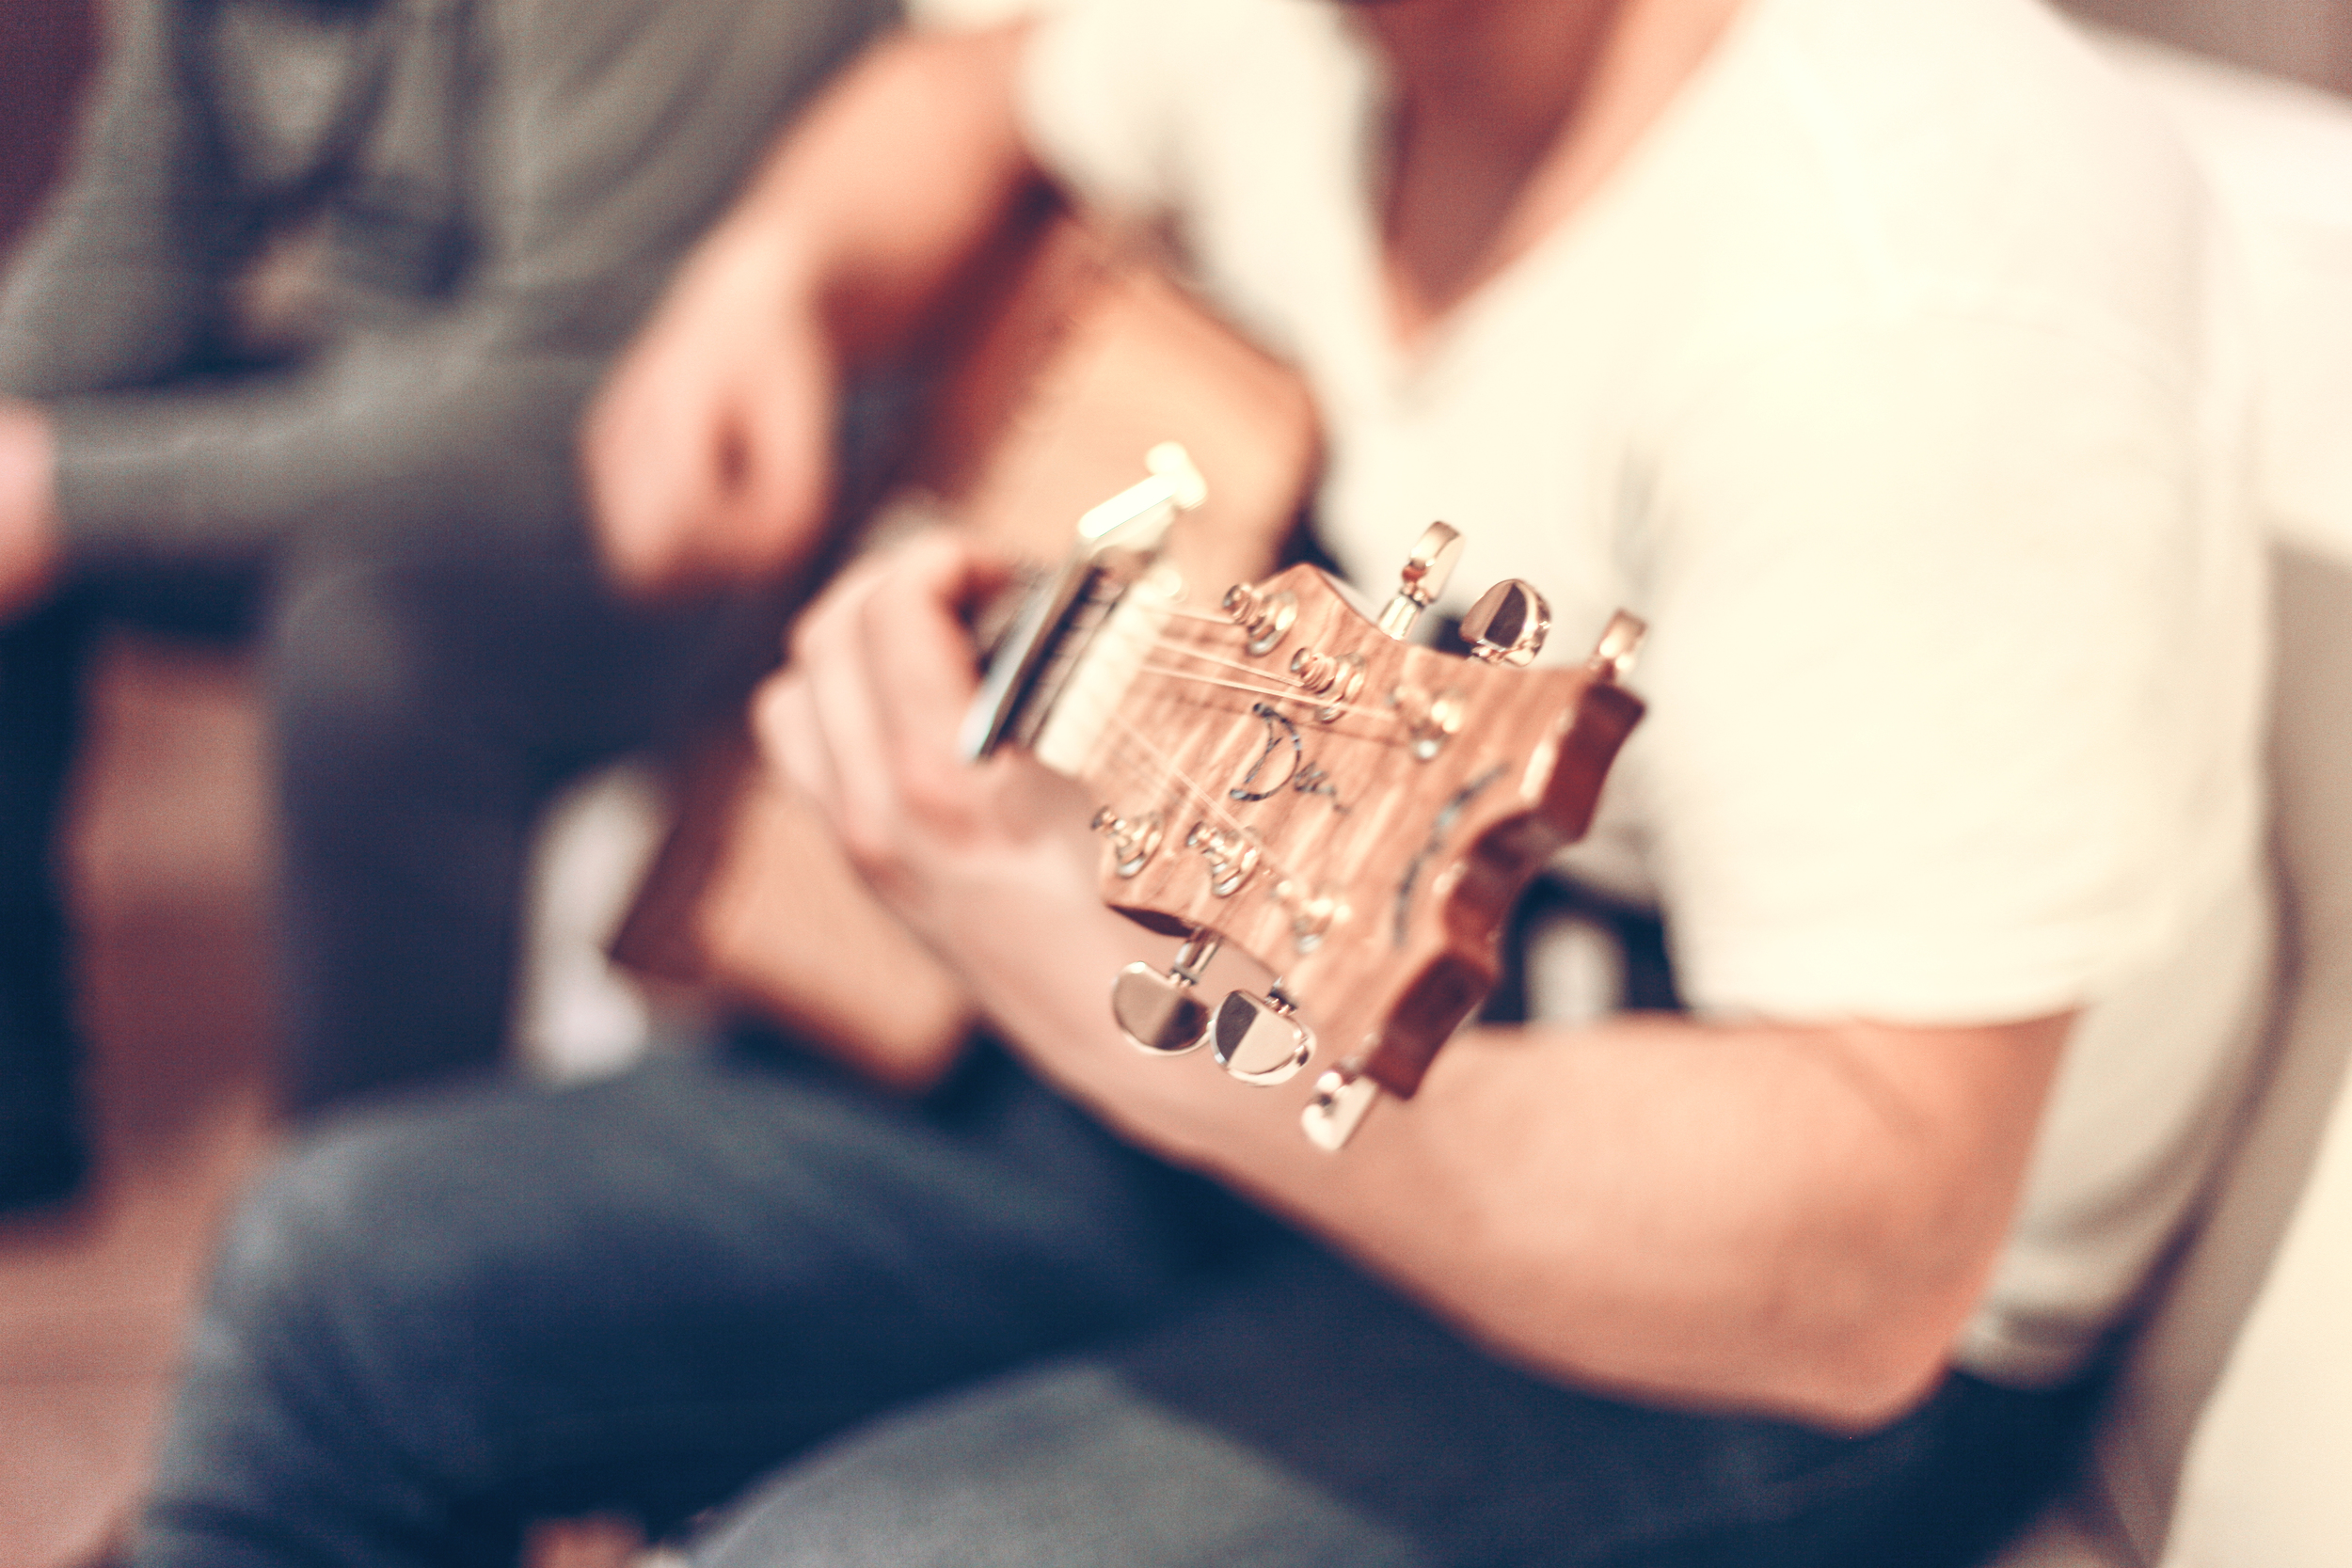 guitar-man-music-1221.jpg